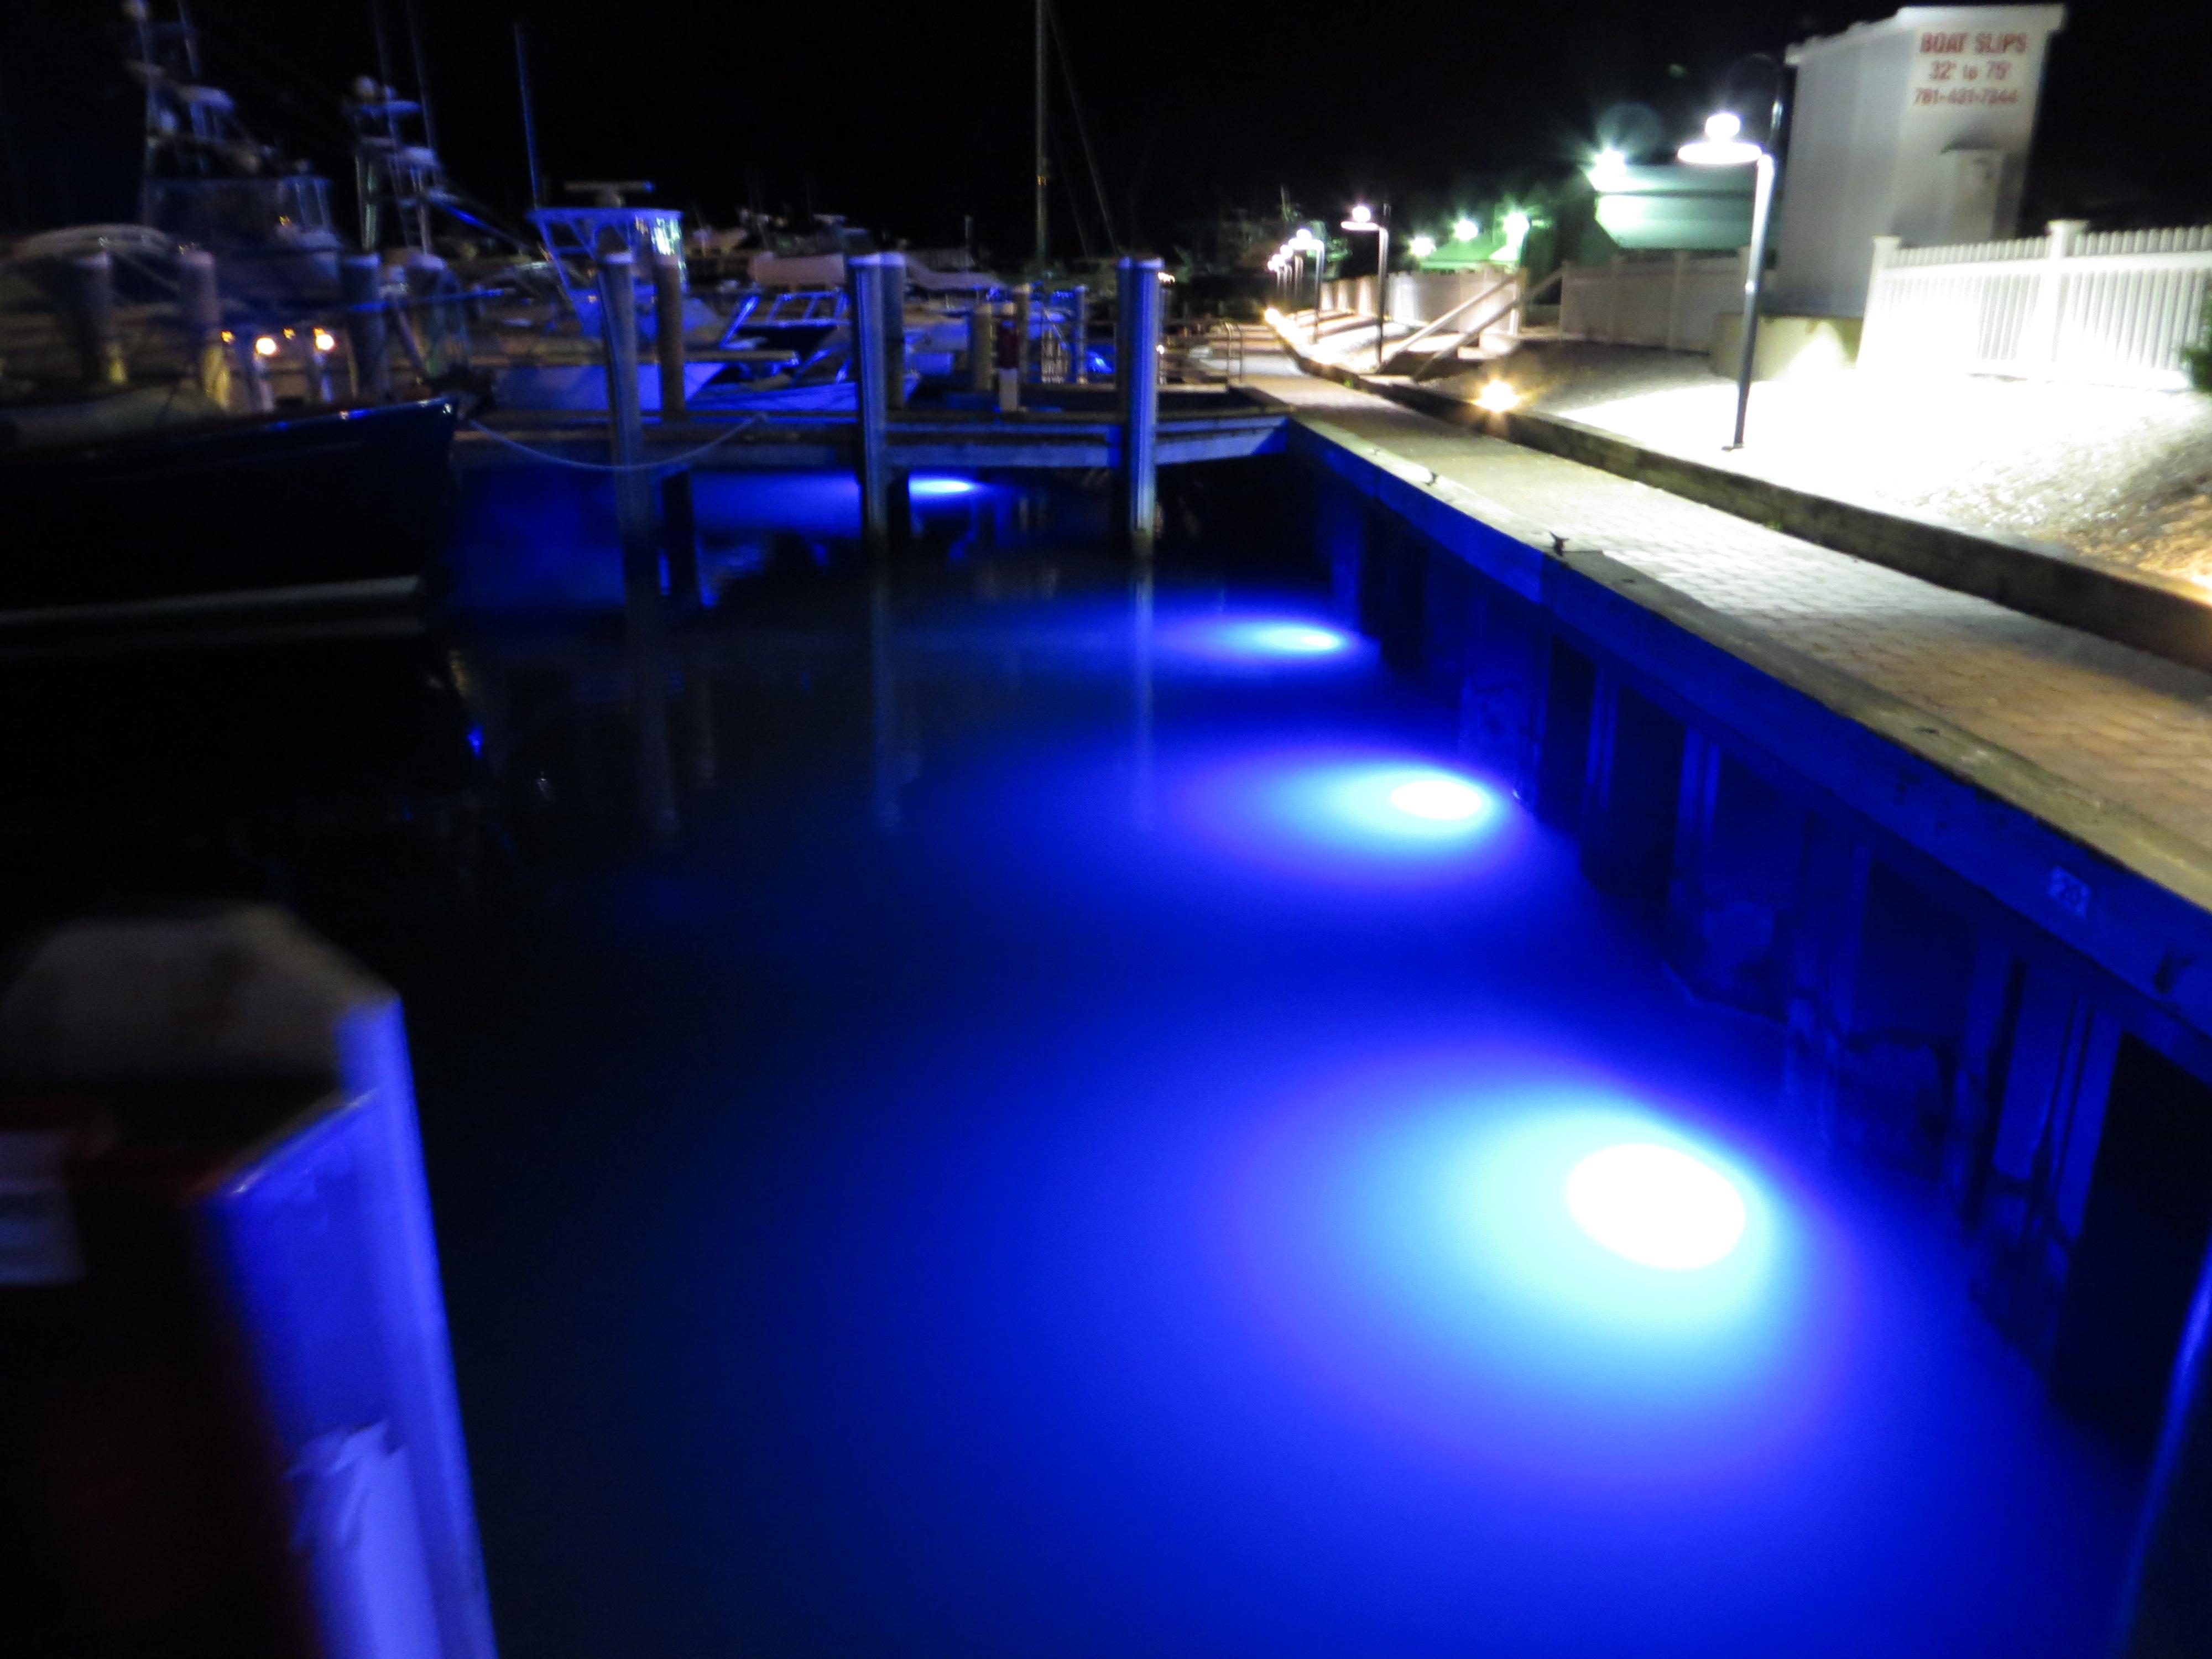 photo gallery - loomis ledloomis led, Reel Combo